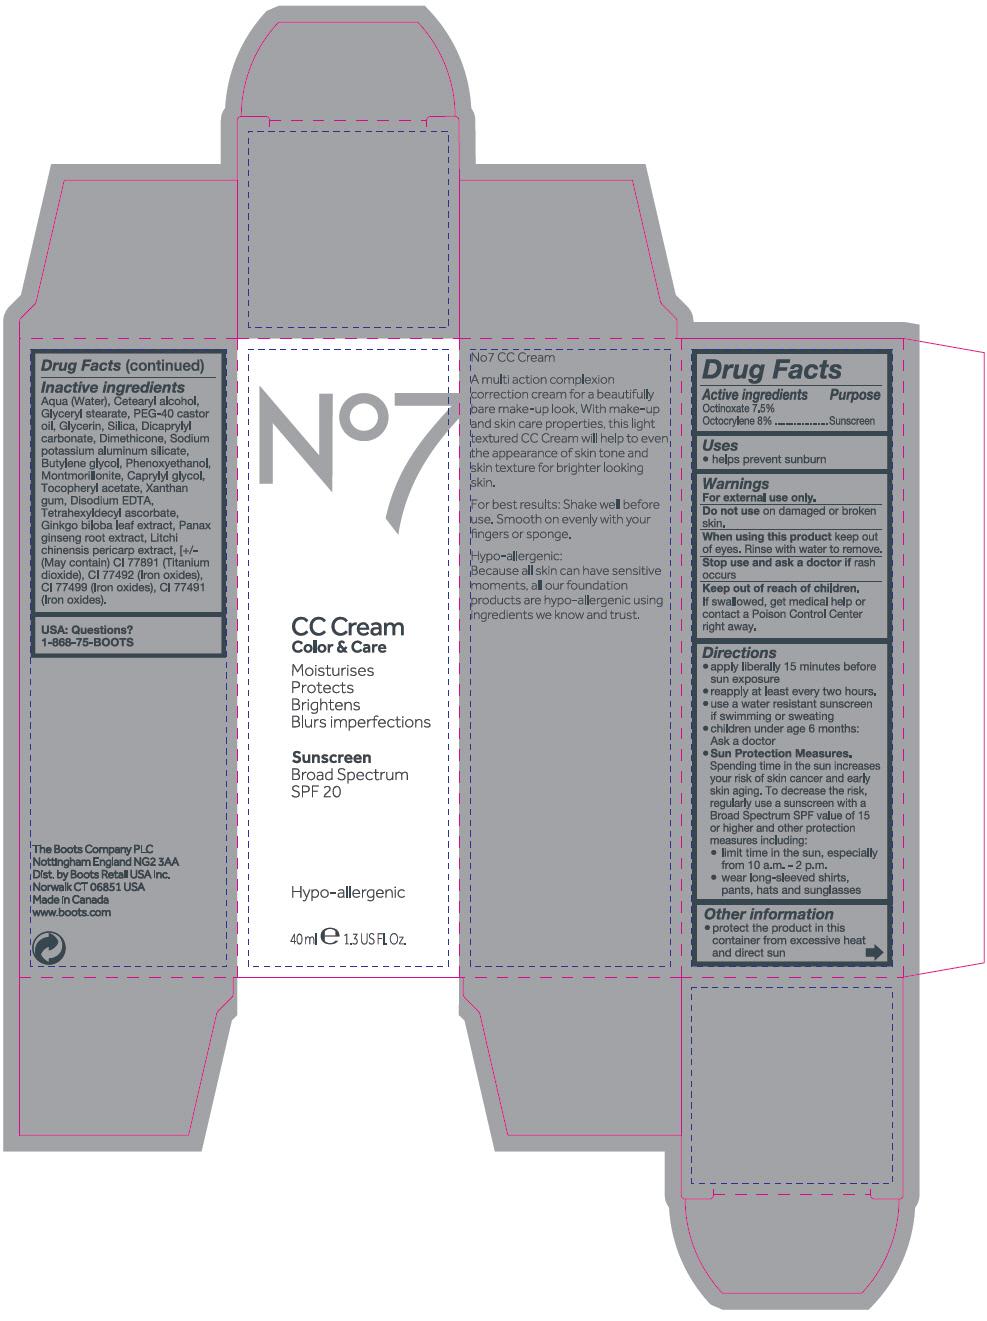 No7 Cc Light (Octocrylene And Octinoxate) Emulsion No7 Cc Medium (Octocrylene And Octinoxate) Emulsion [Cosmetica Laboratories Inc.]